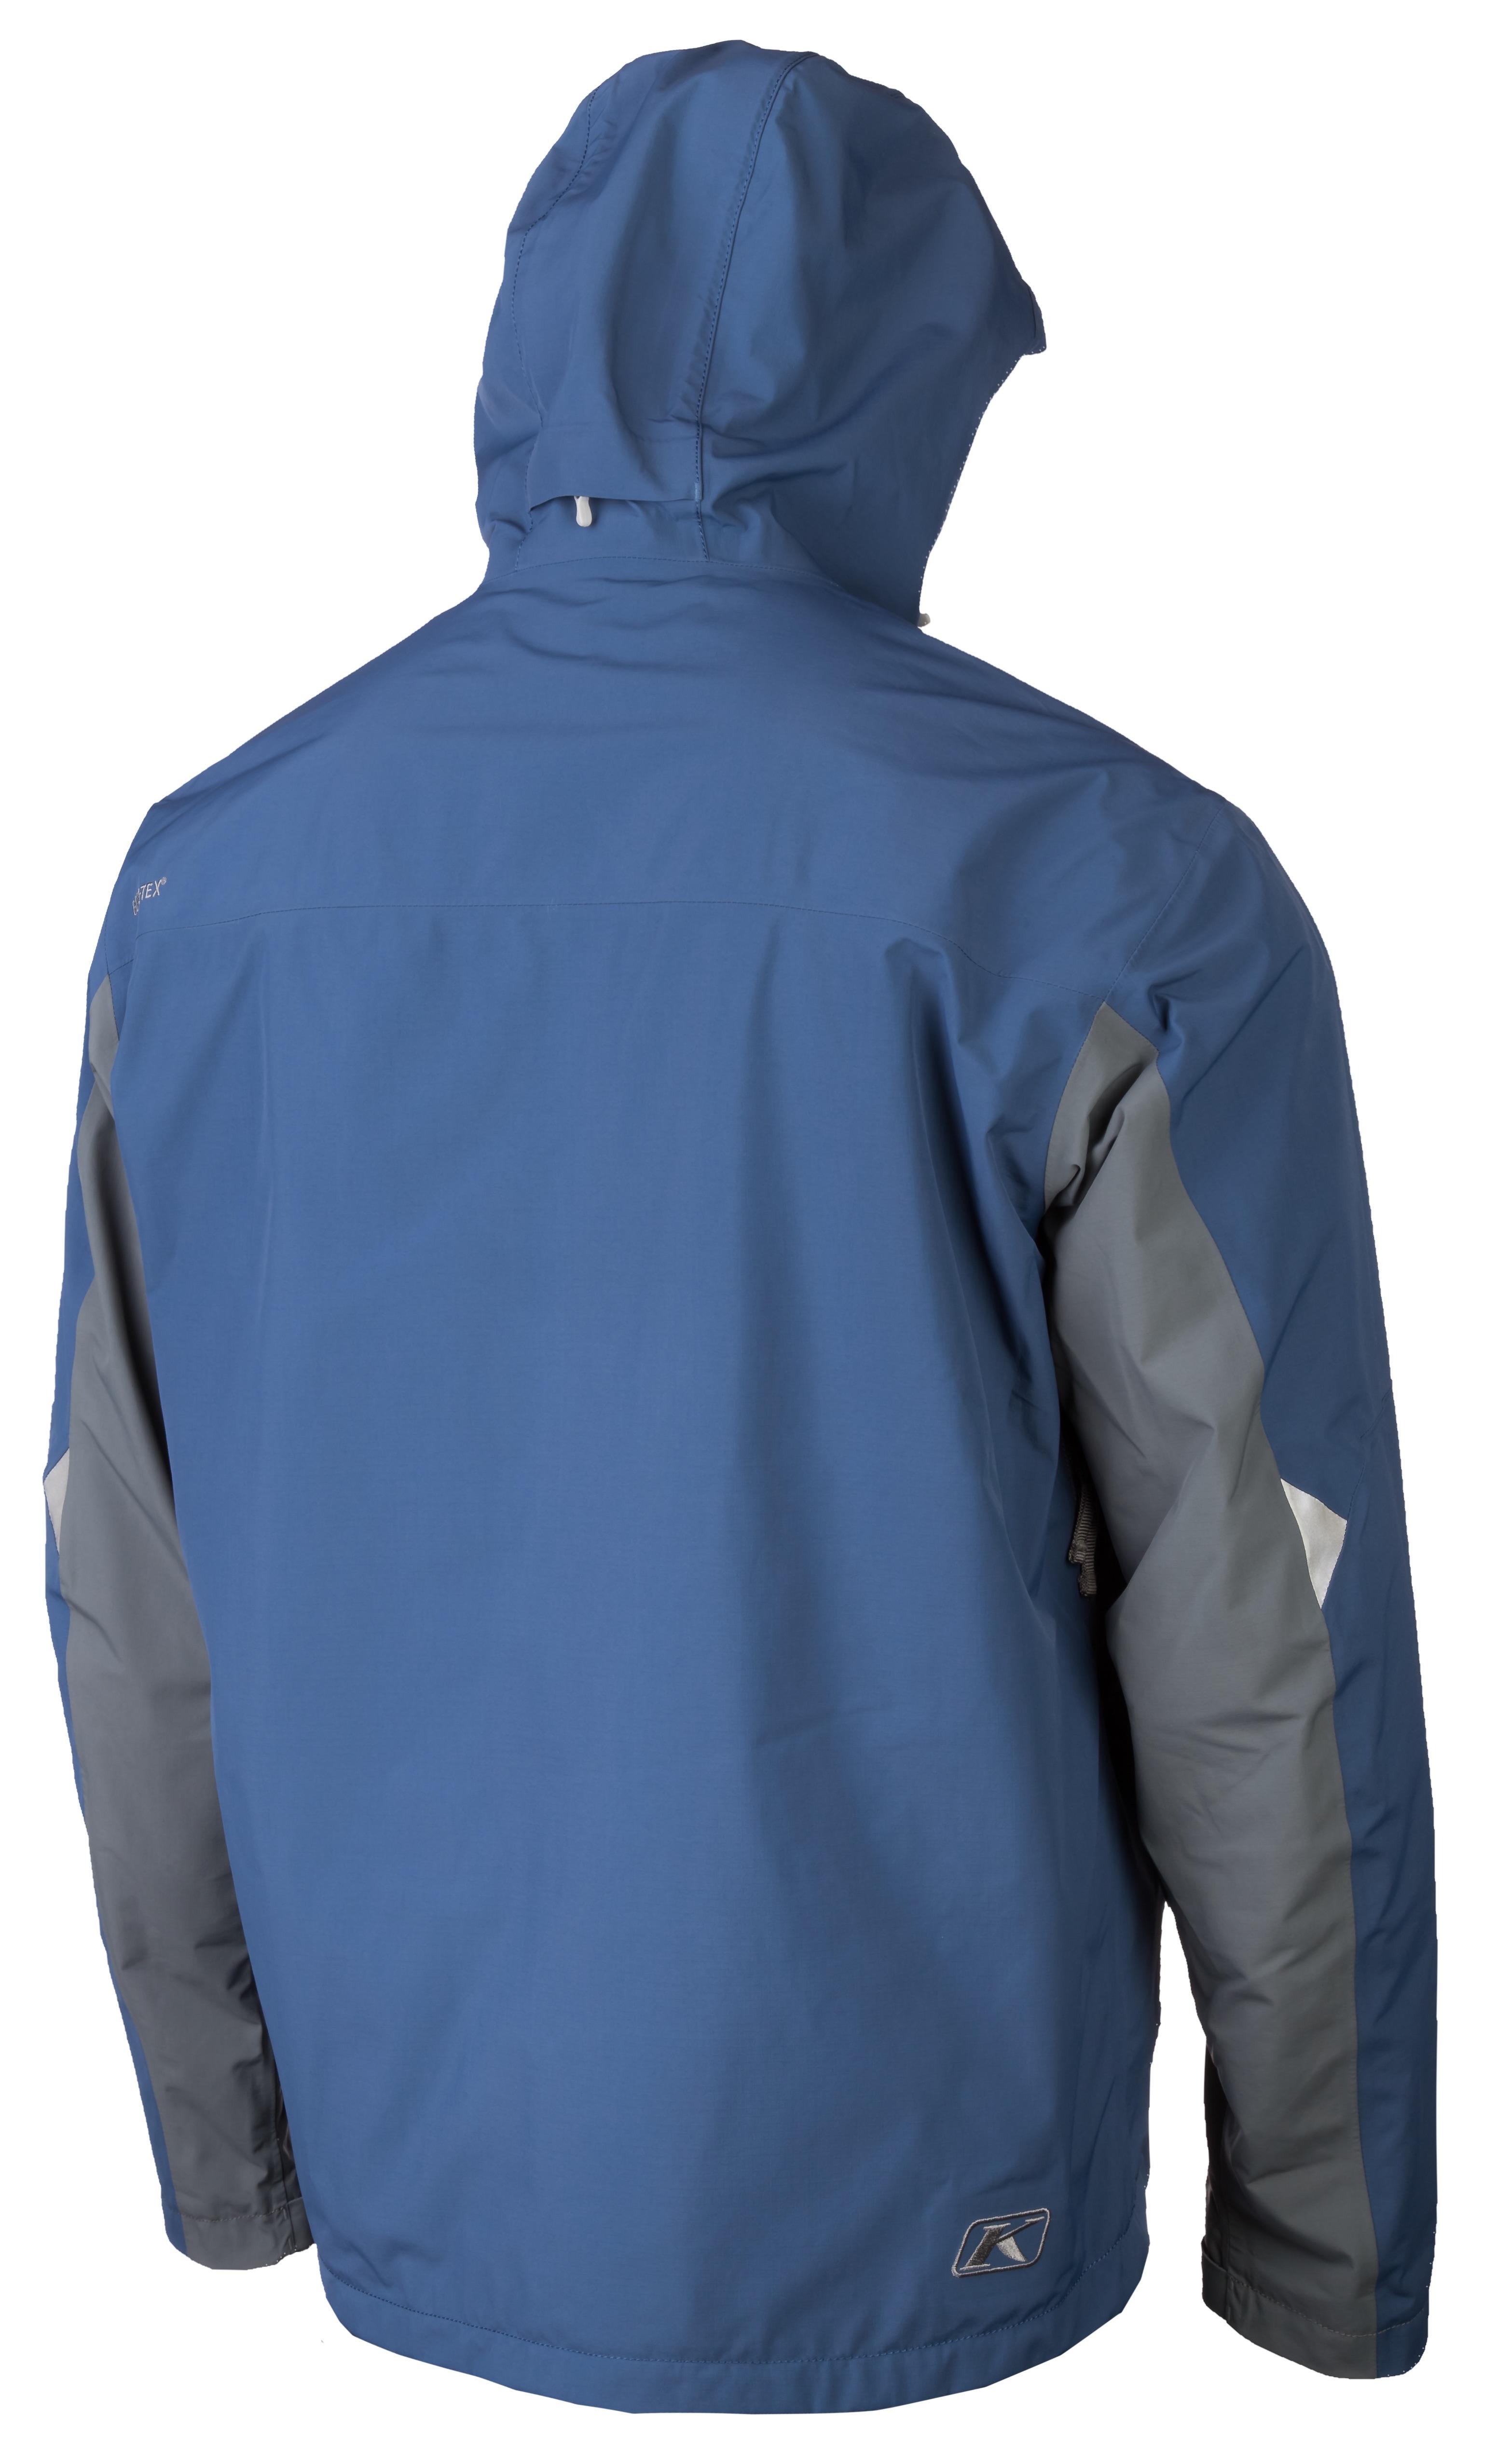 Stow Away Jacket 3148-003_Navy_02